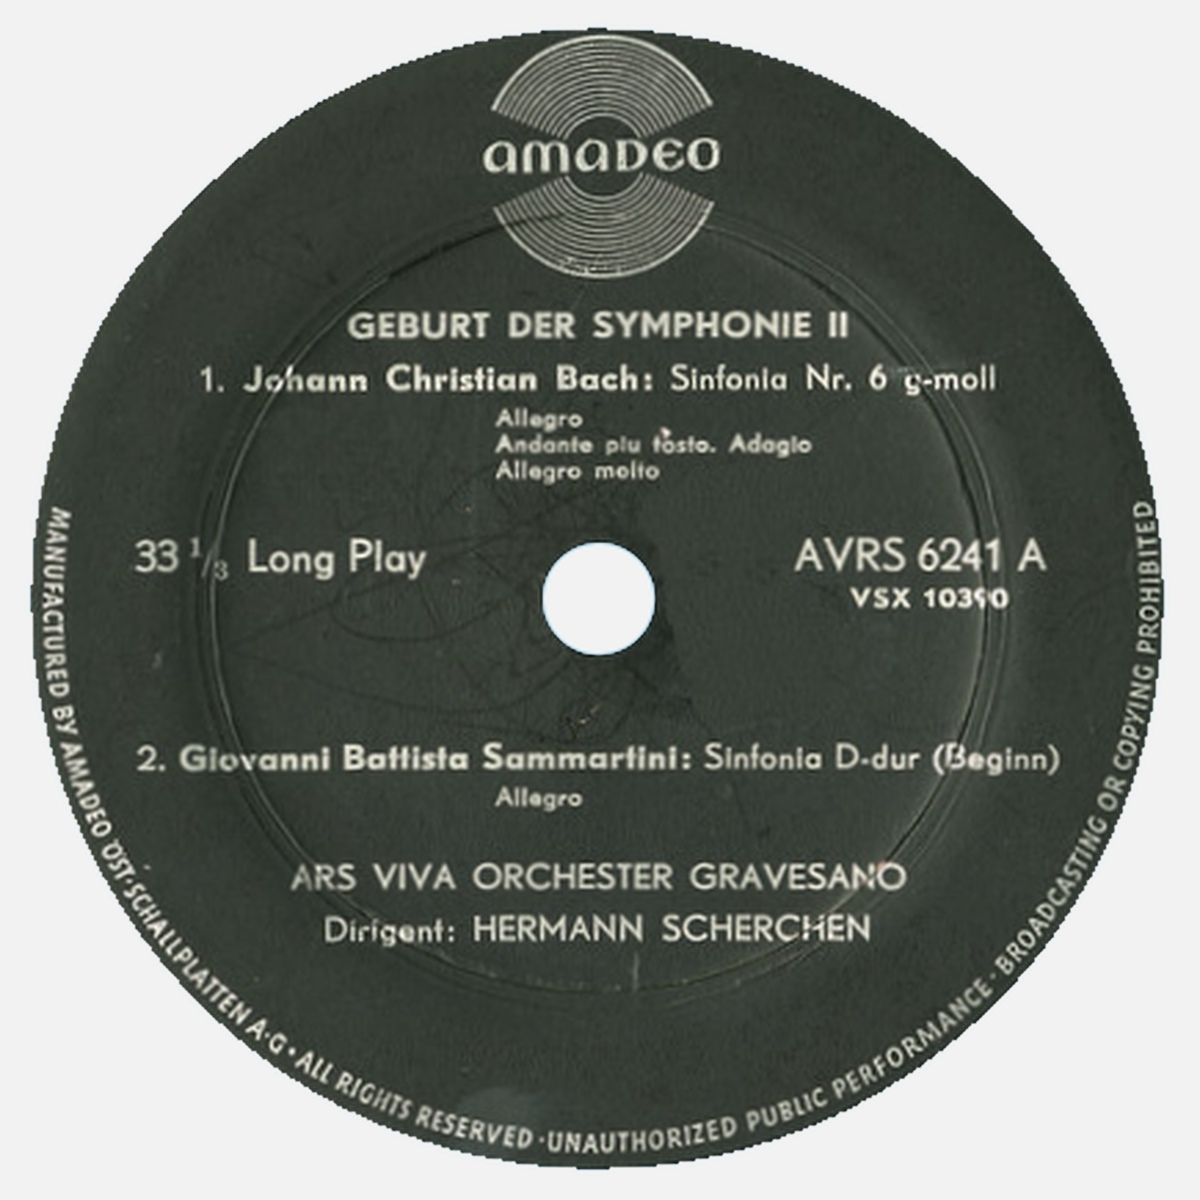 Étiquette recto du disque Amadeo AVRS 6241, 2e volume de «Geburt der Symphonie»